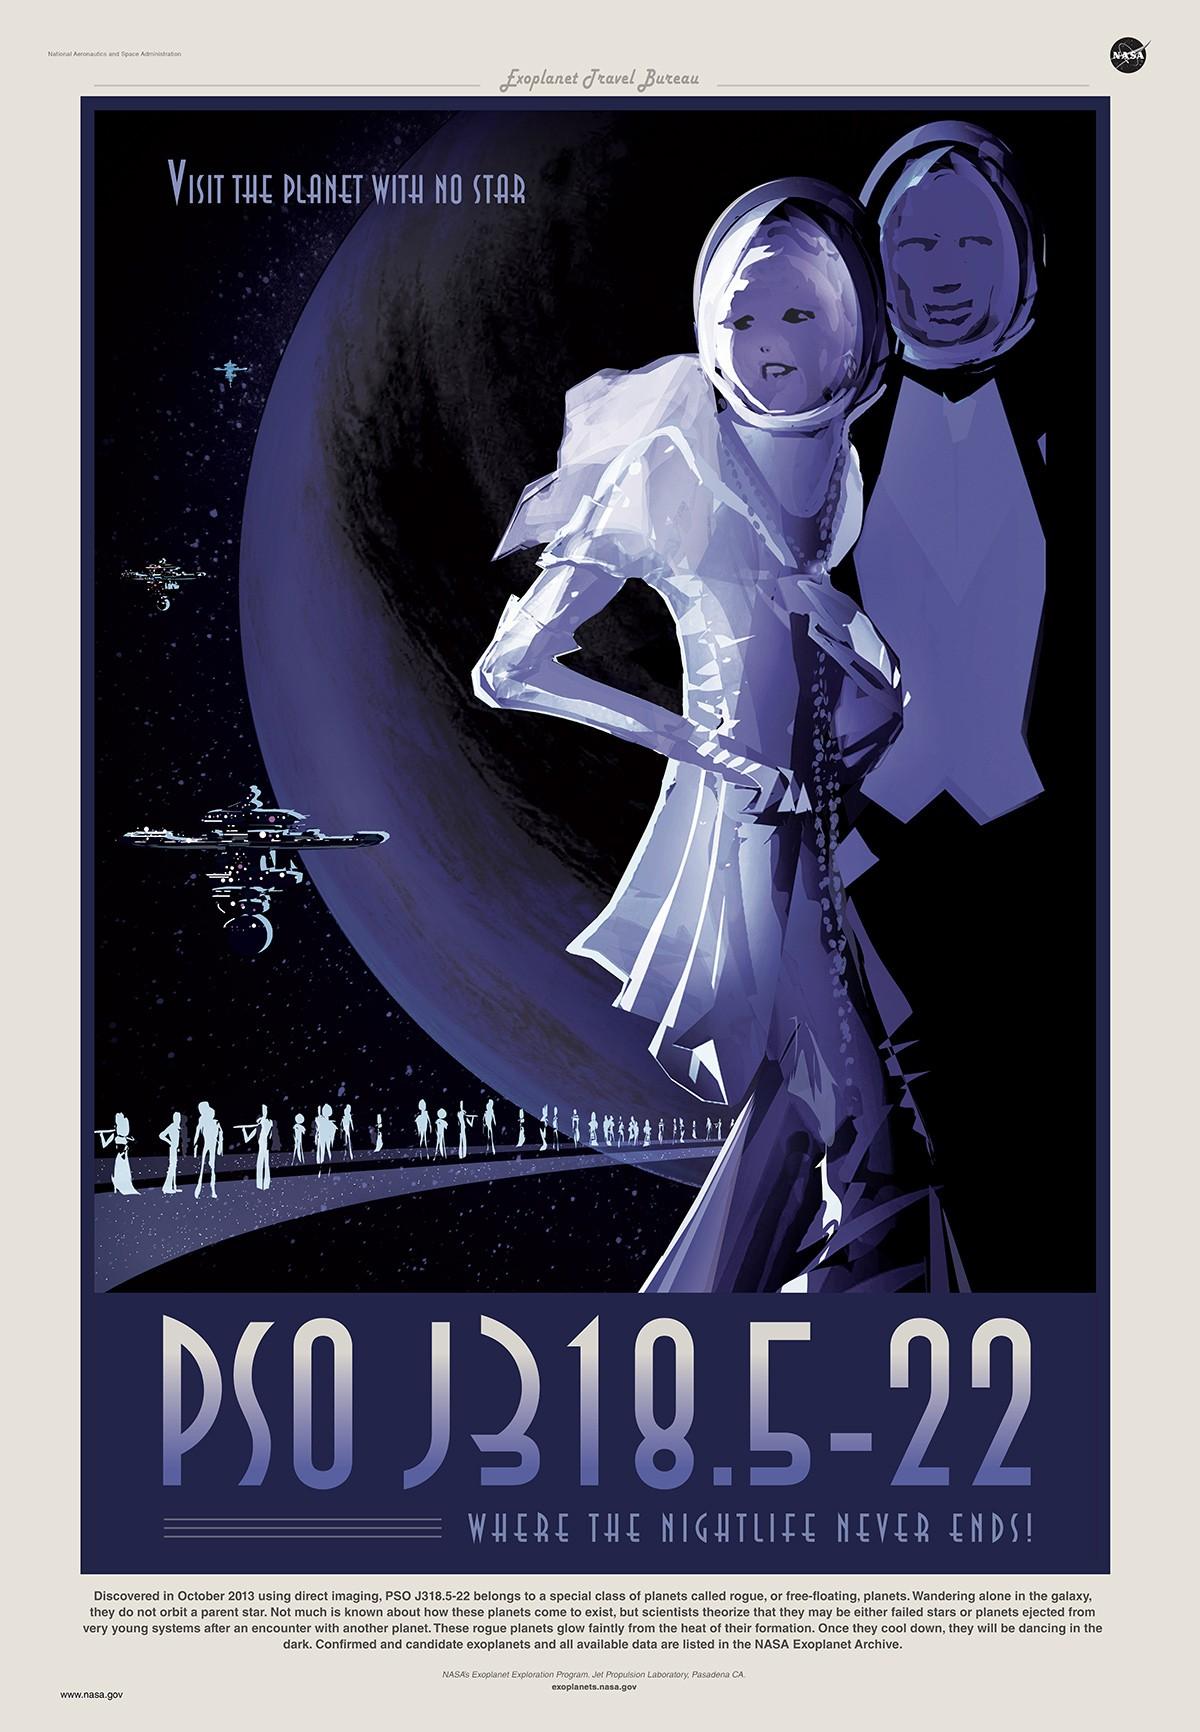 Poster baseado no exoplaneta PSO J318.5-22. (Foto: Nasa/Exoplanet Project)